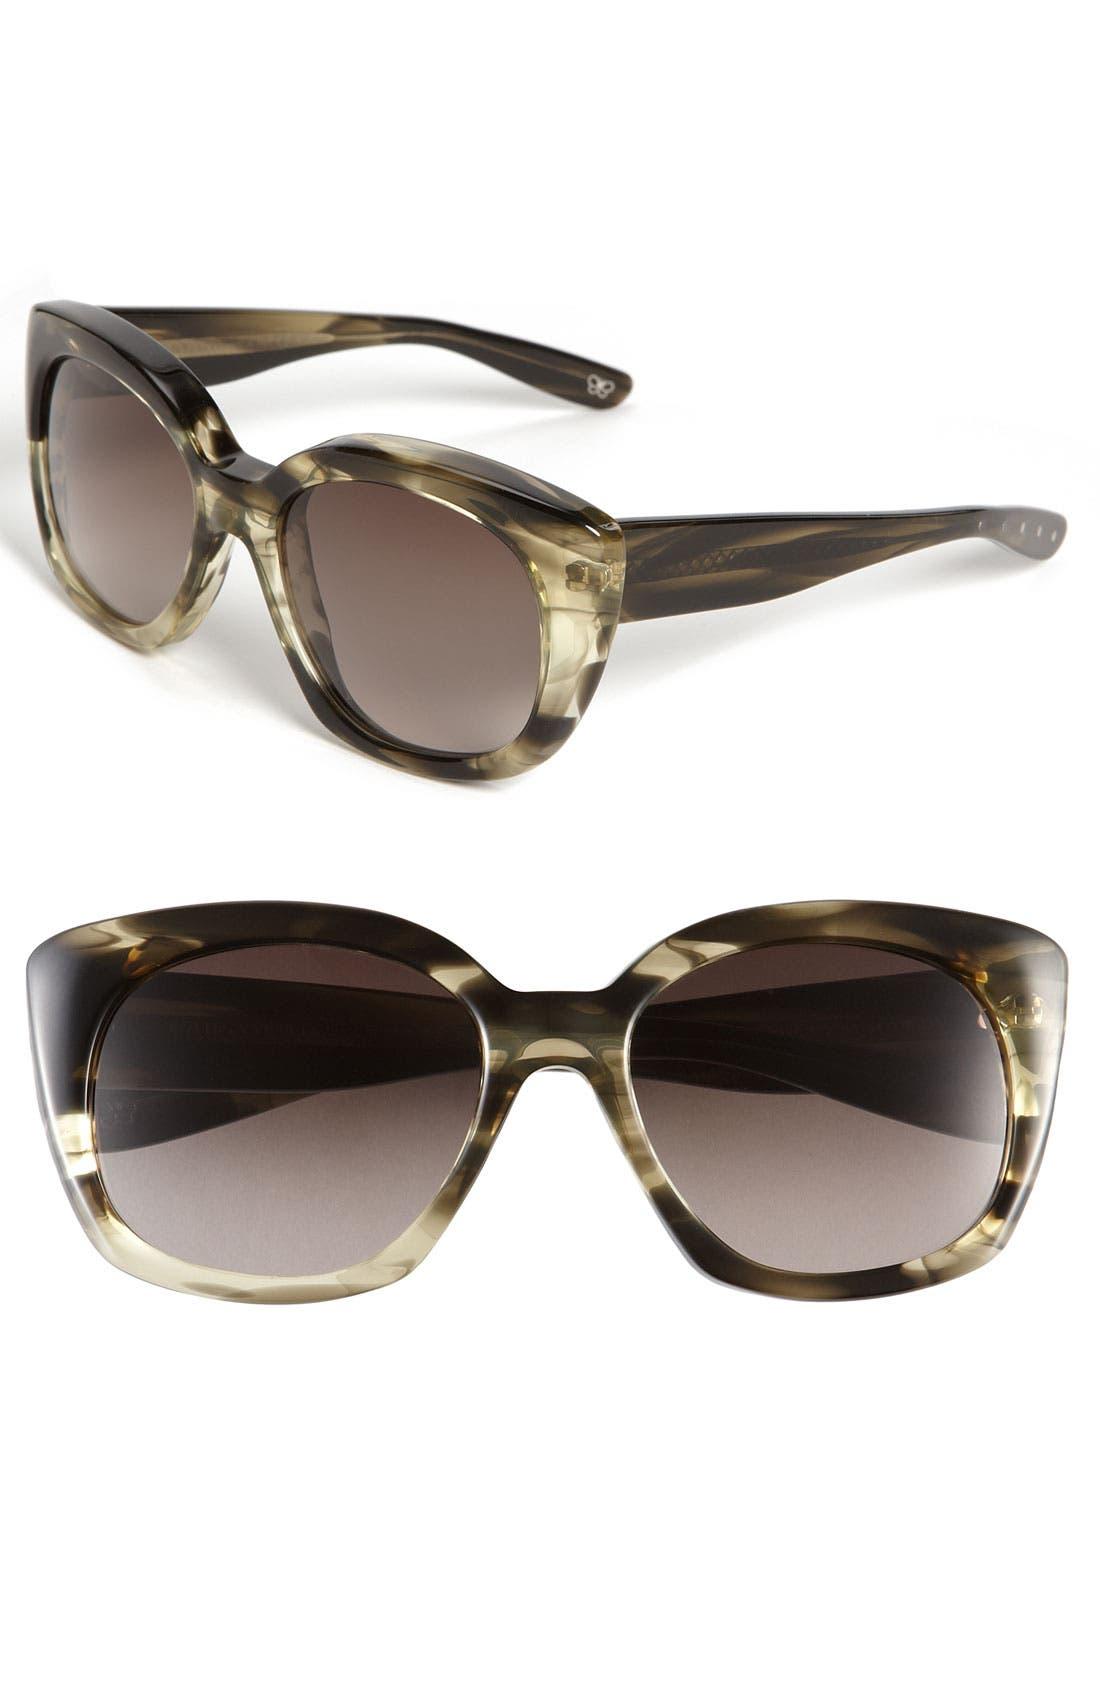 Main Image - Bottega Veneta Cat's Eye Sunglasses